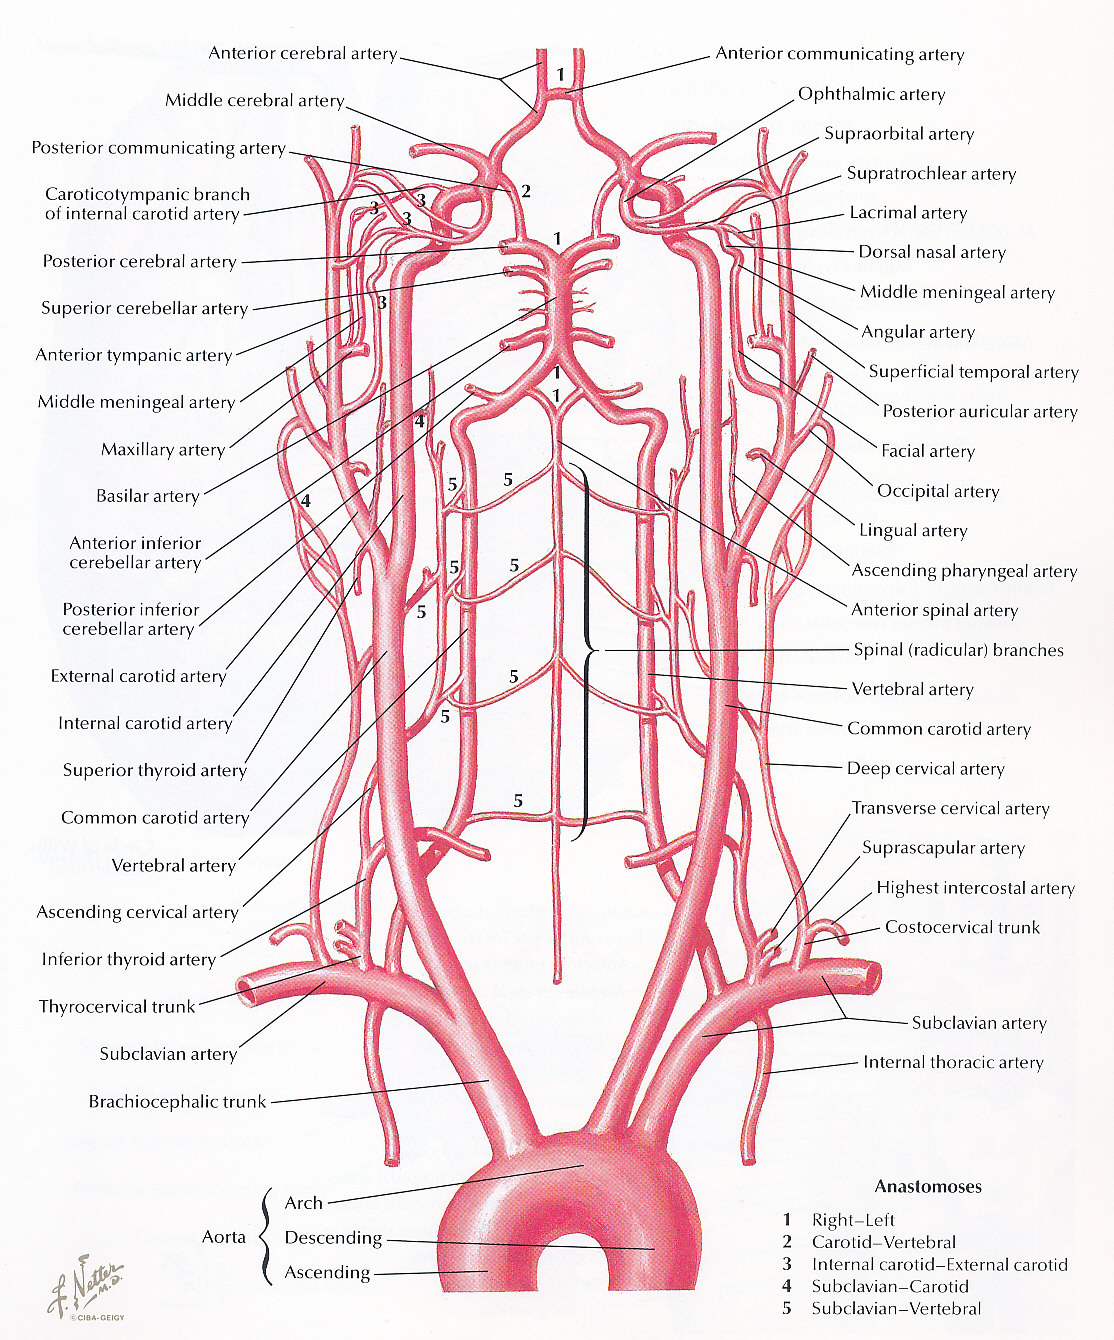 Pedi cardiology: Subclavian Steal - Mechansim